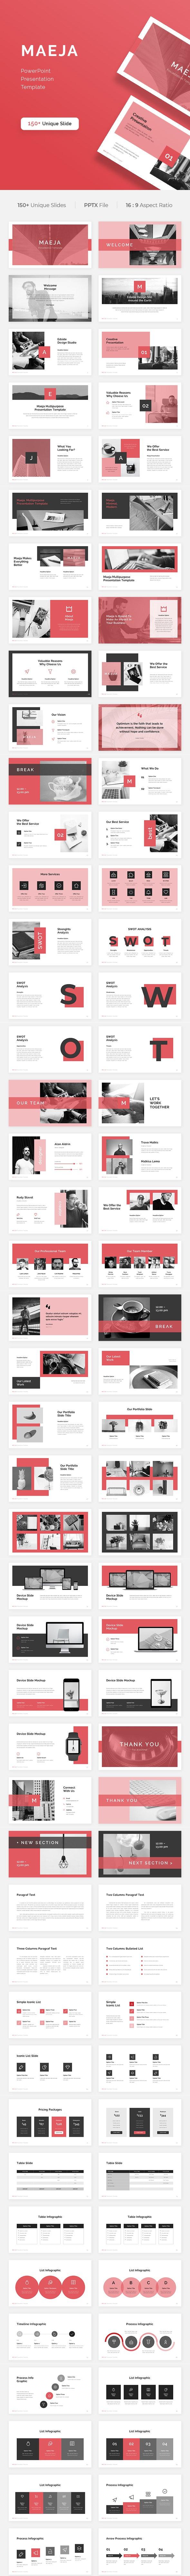 Maeja PowerPoint Presentation Template - Business PowerPoint Templates